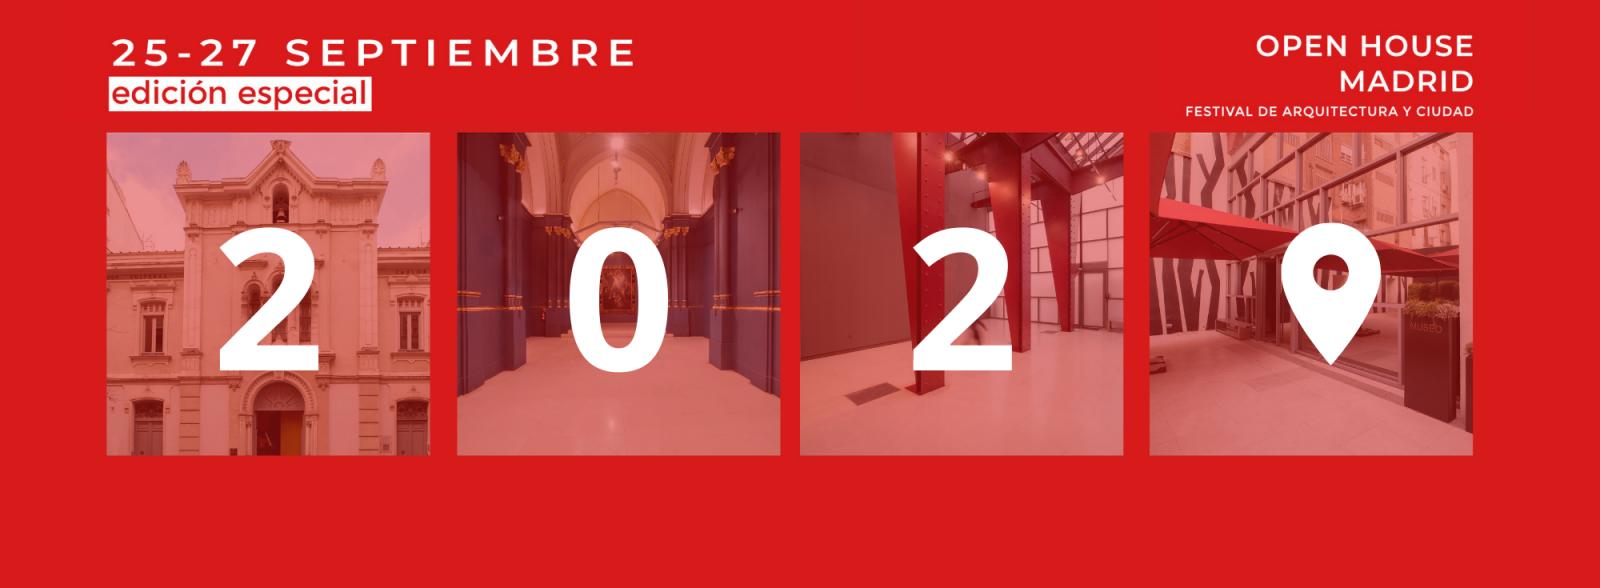 Open House Madrid 2020